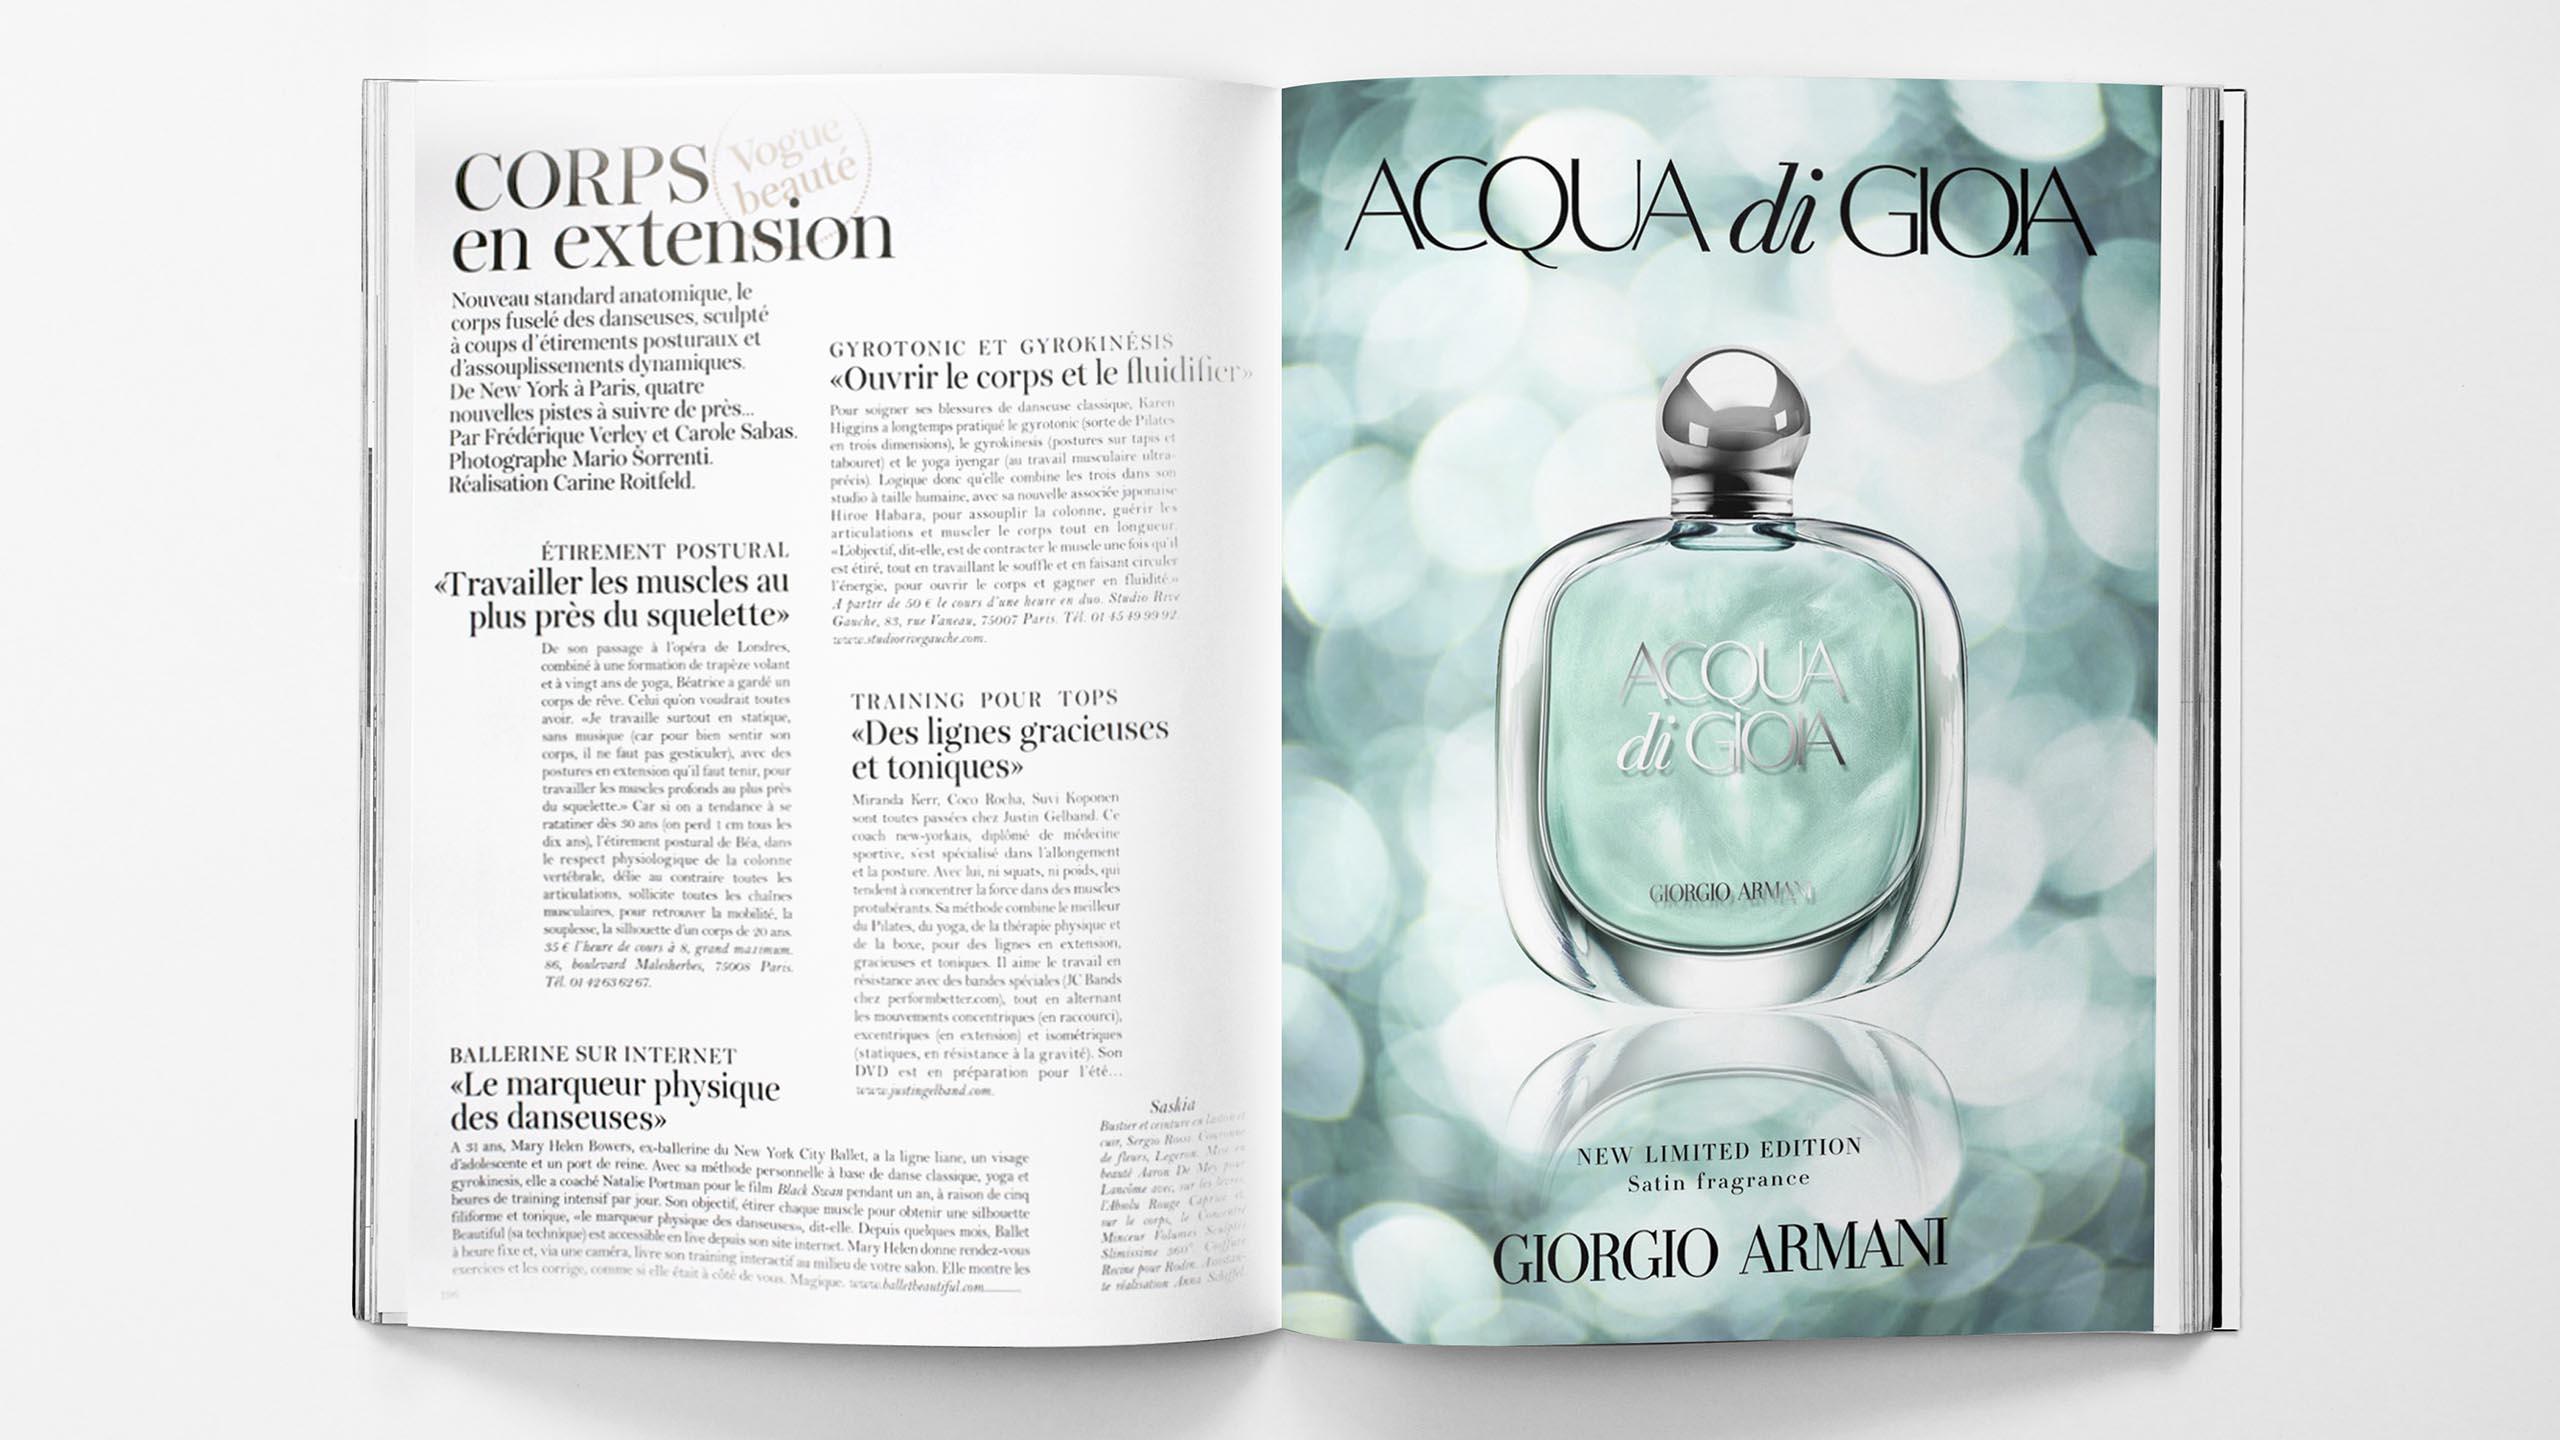 Satin Edition of Giorgio Armani's Essenza perfume